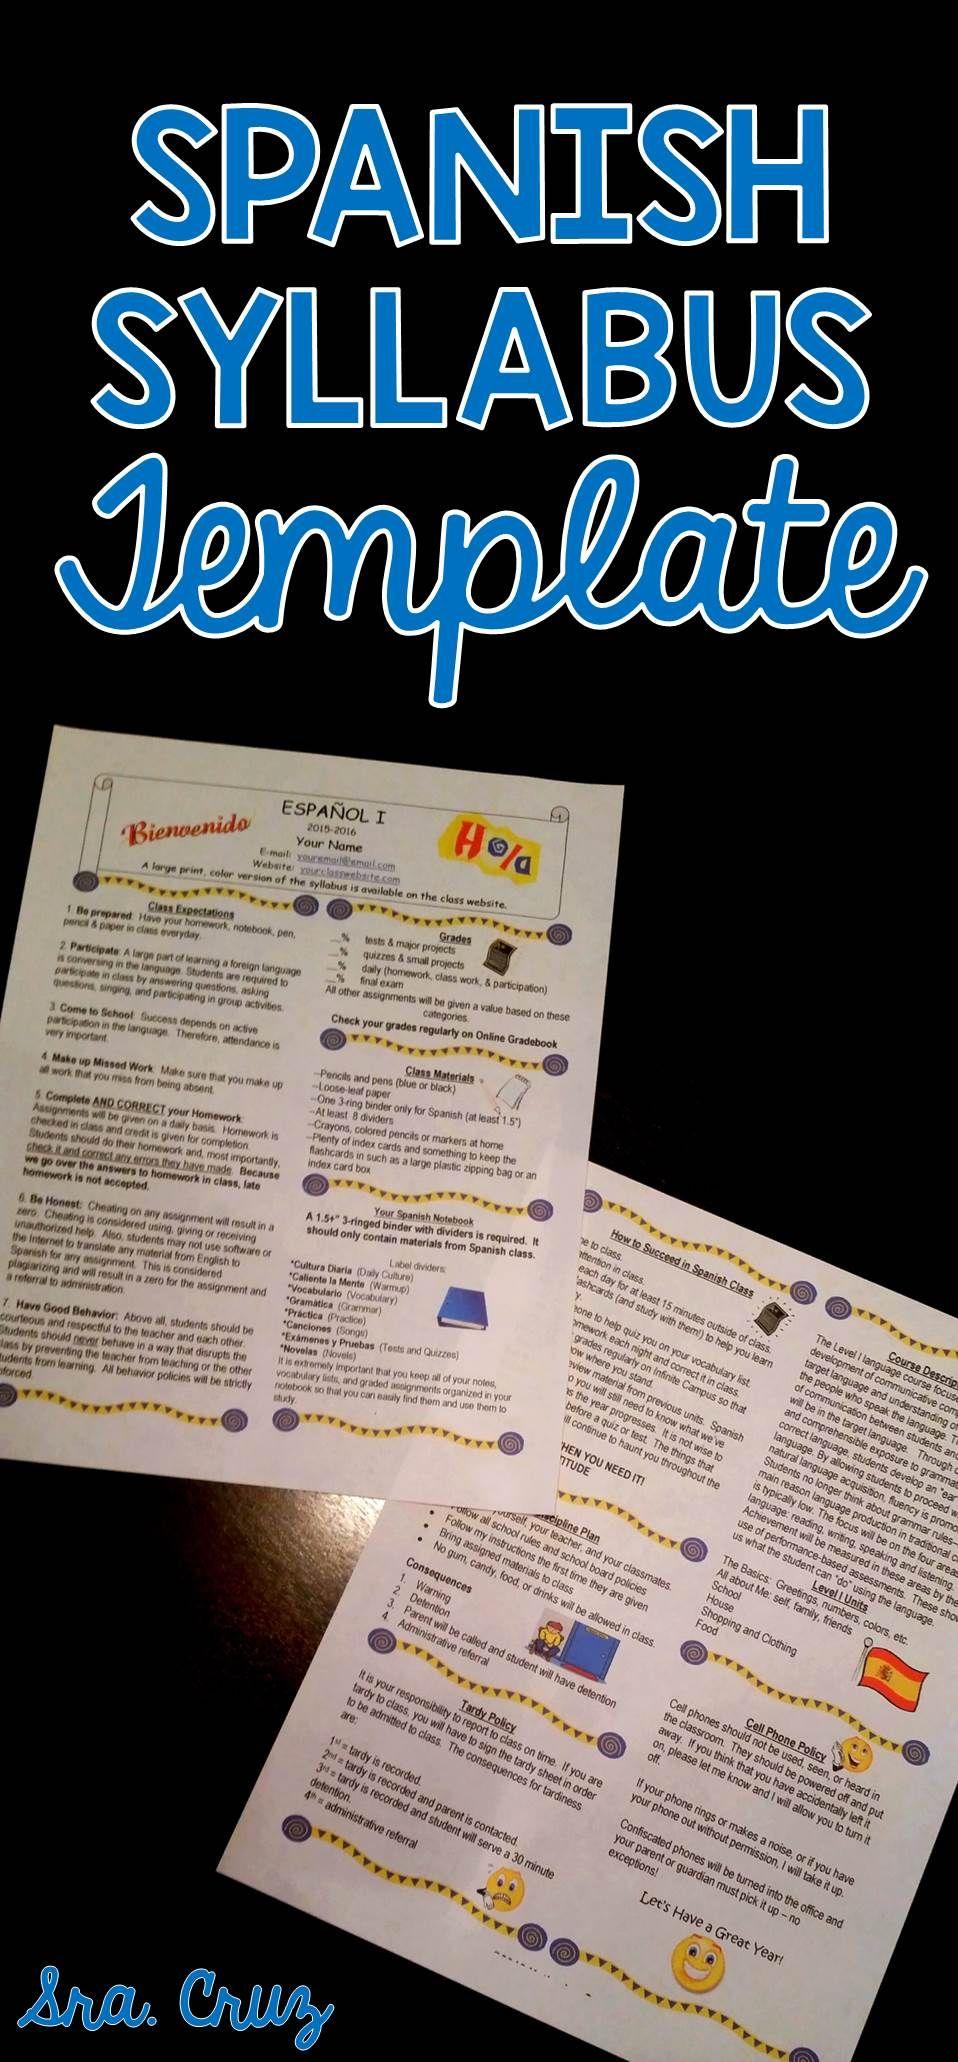 Spanish Syllabus Template  Syllabus Template Classroom